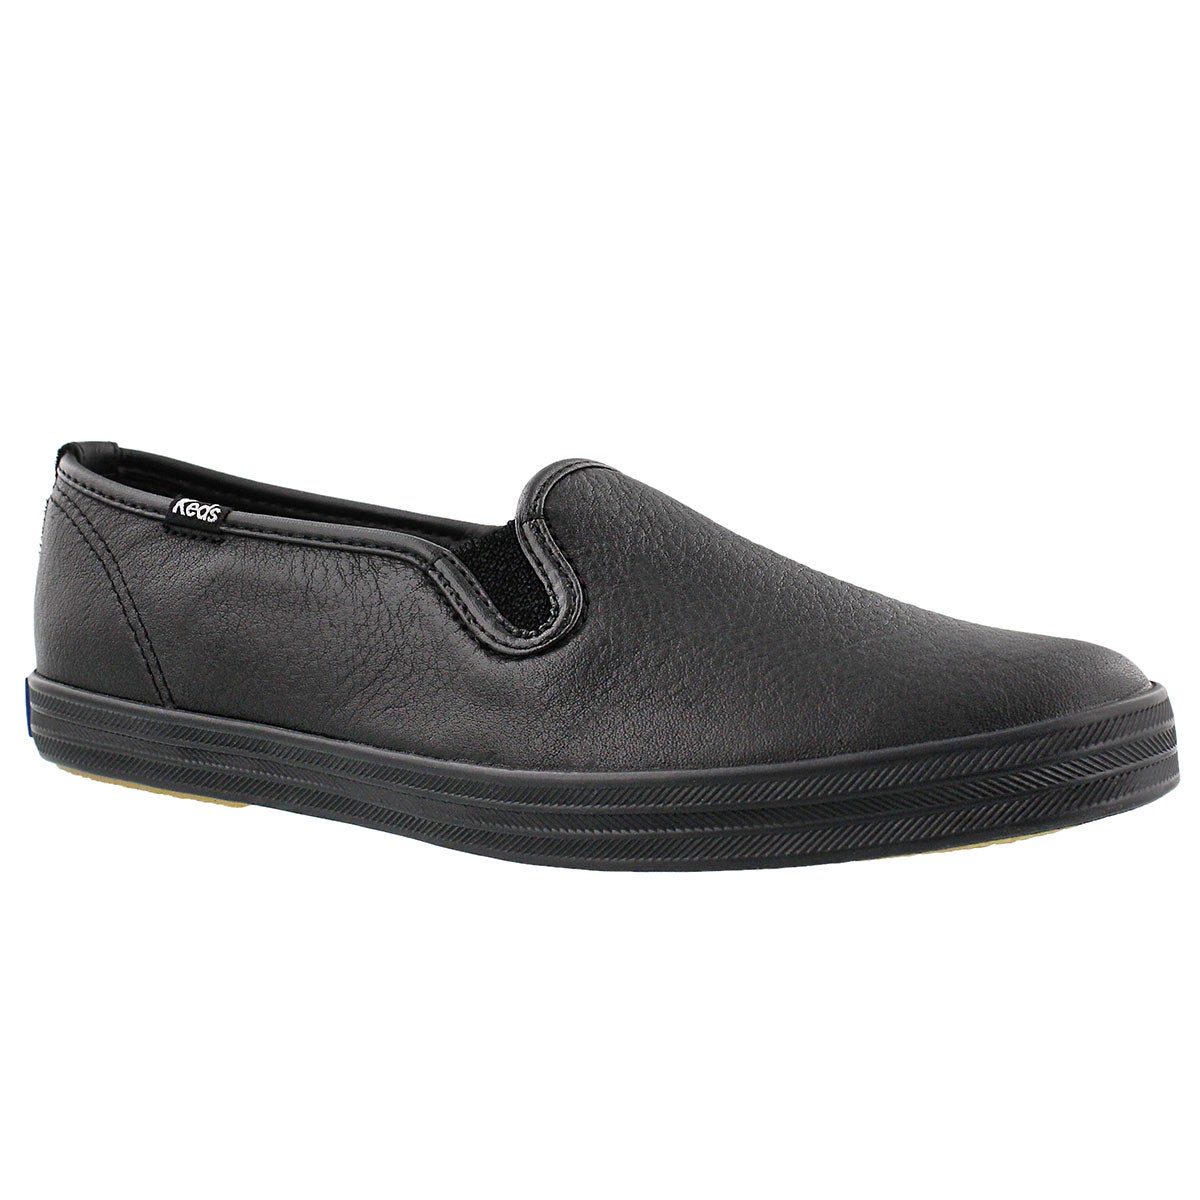 Lds Champion blk leather slip on sneaker